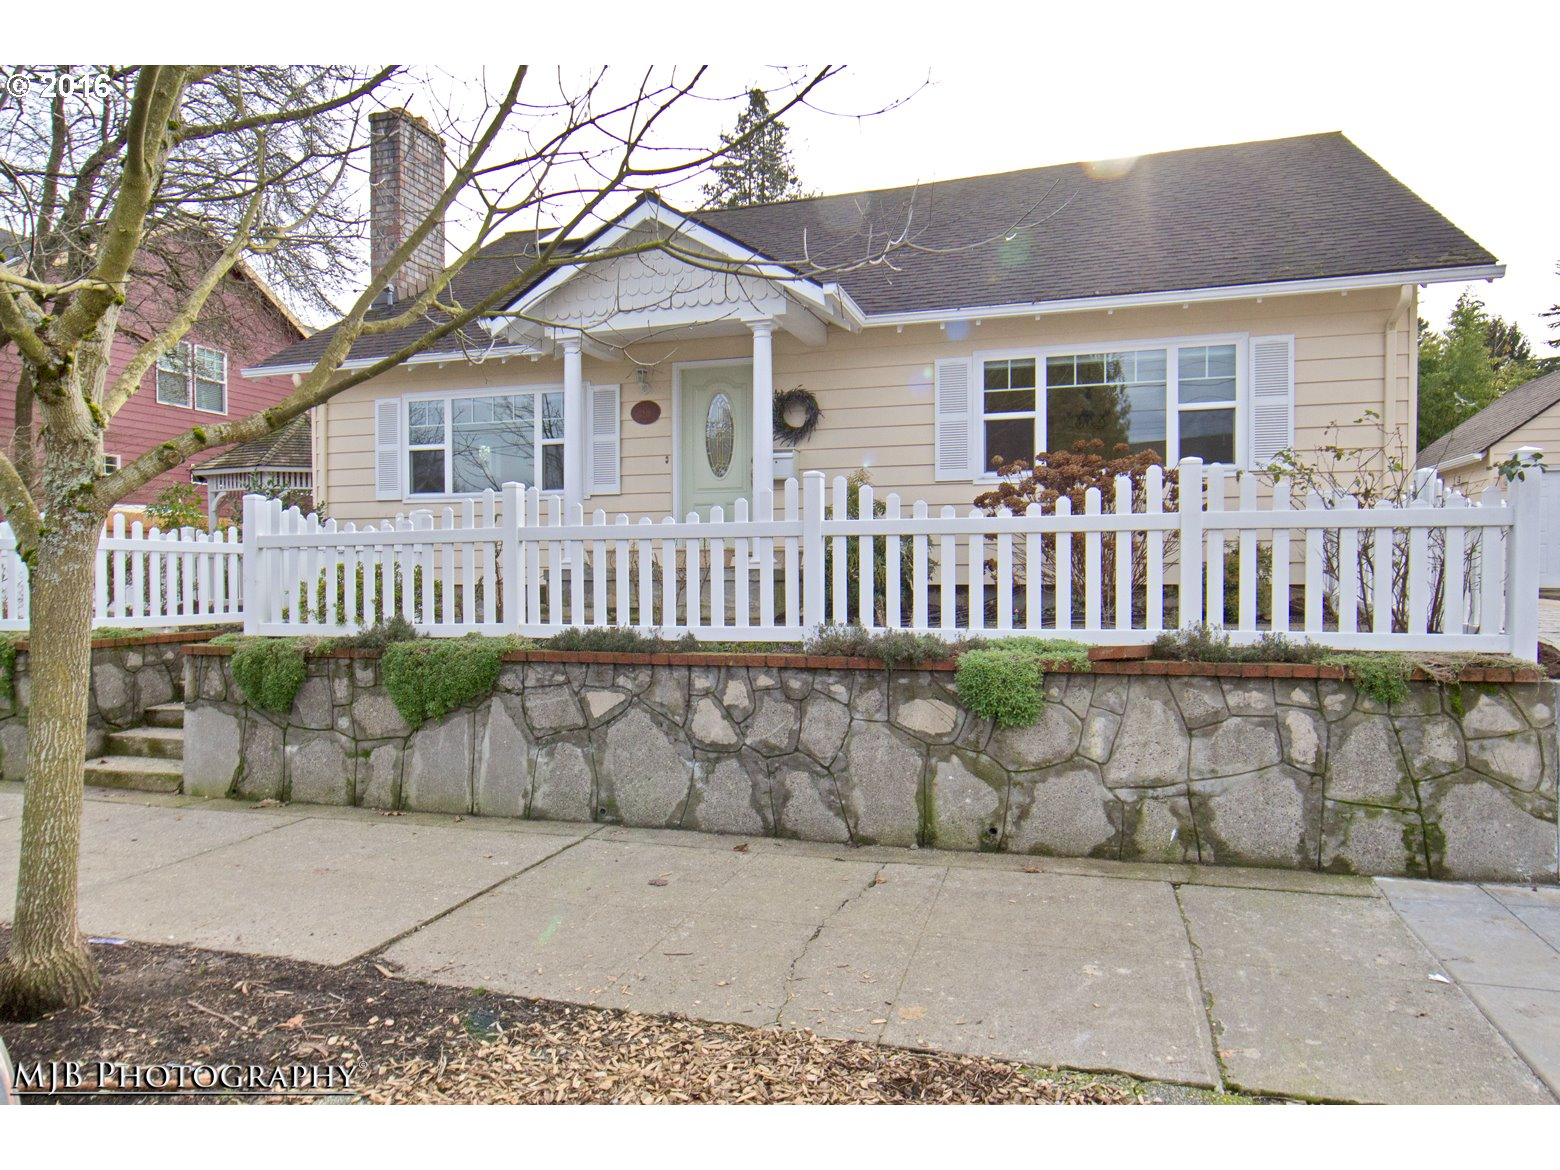 2816 N WATTS ST, Portland, OR 97217